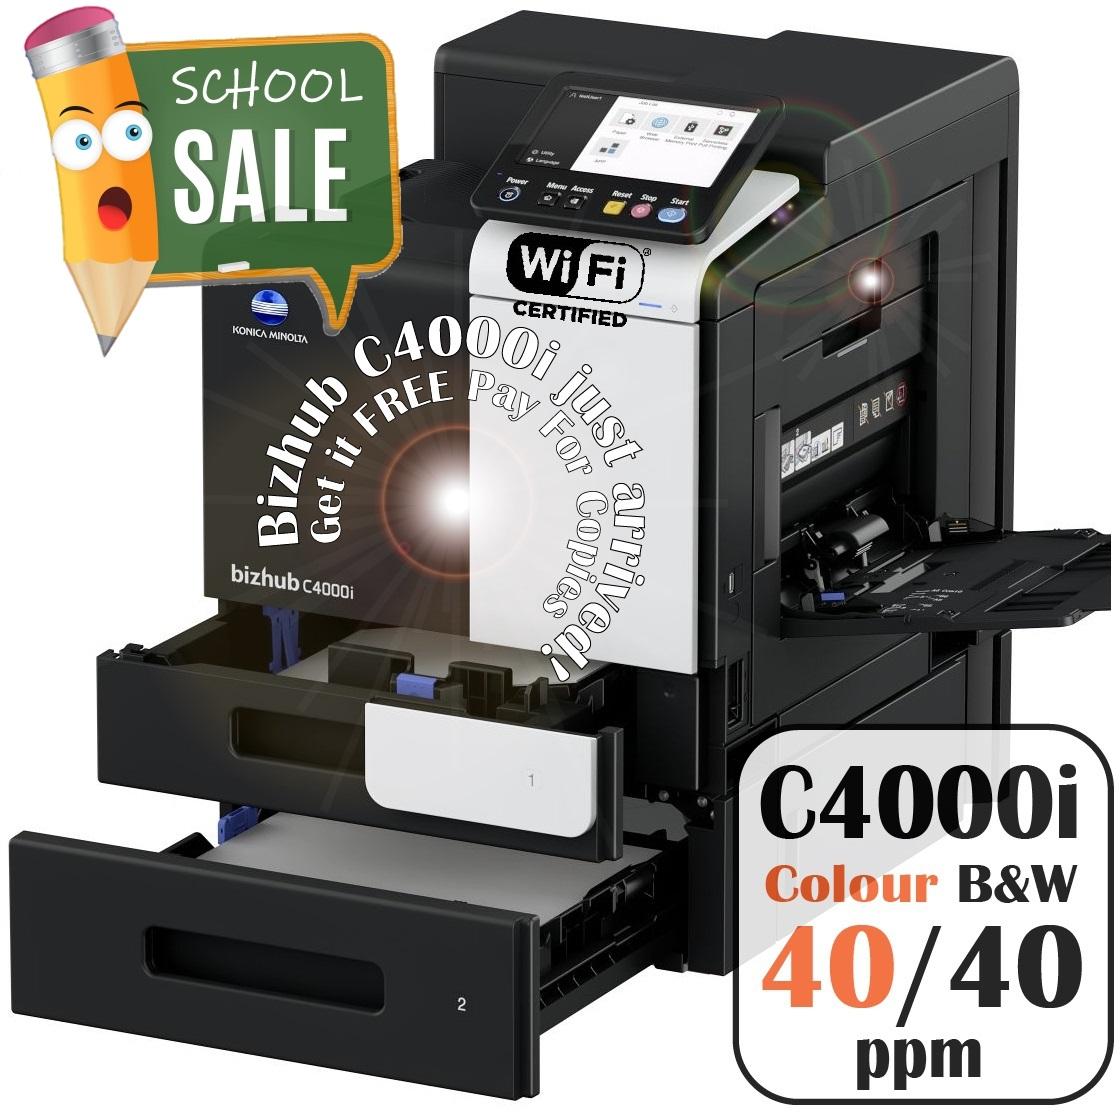 Konica Minolta Bizhub C4000i PF P20 Colour Printer Rental Price Offers Open Trays